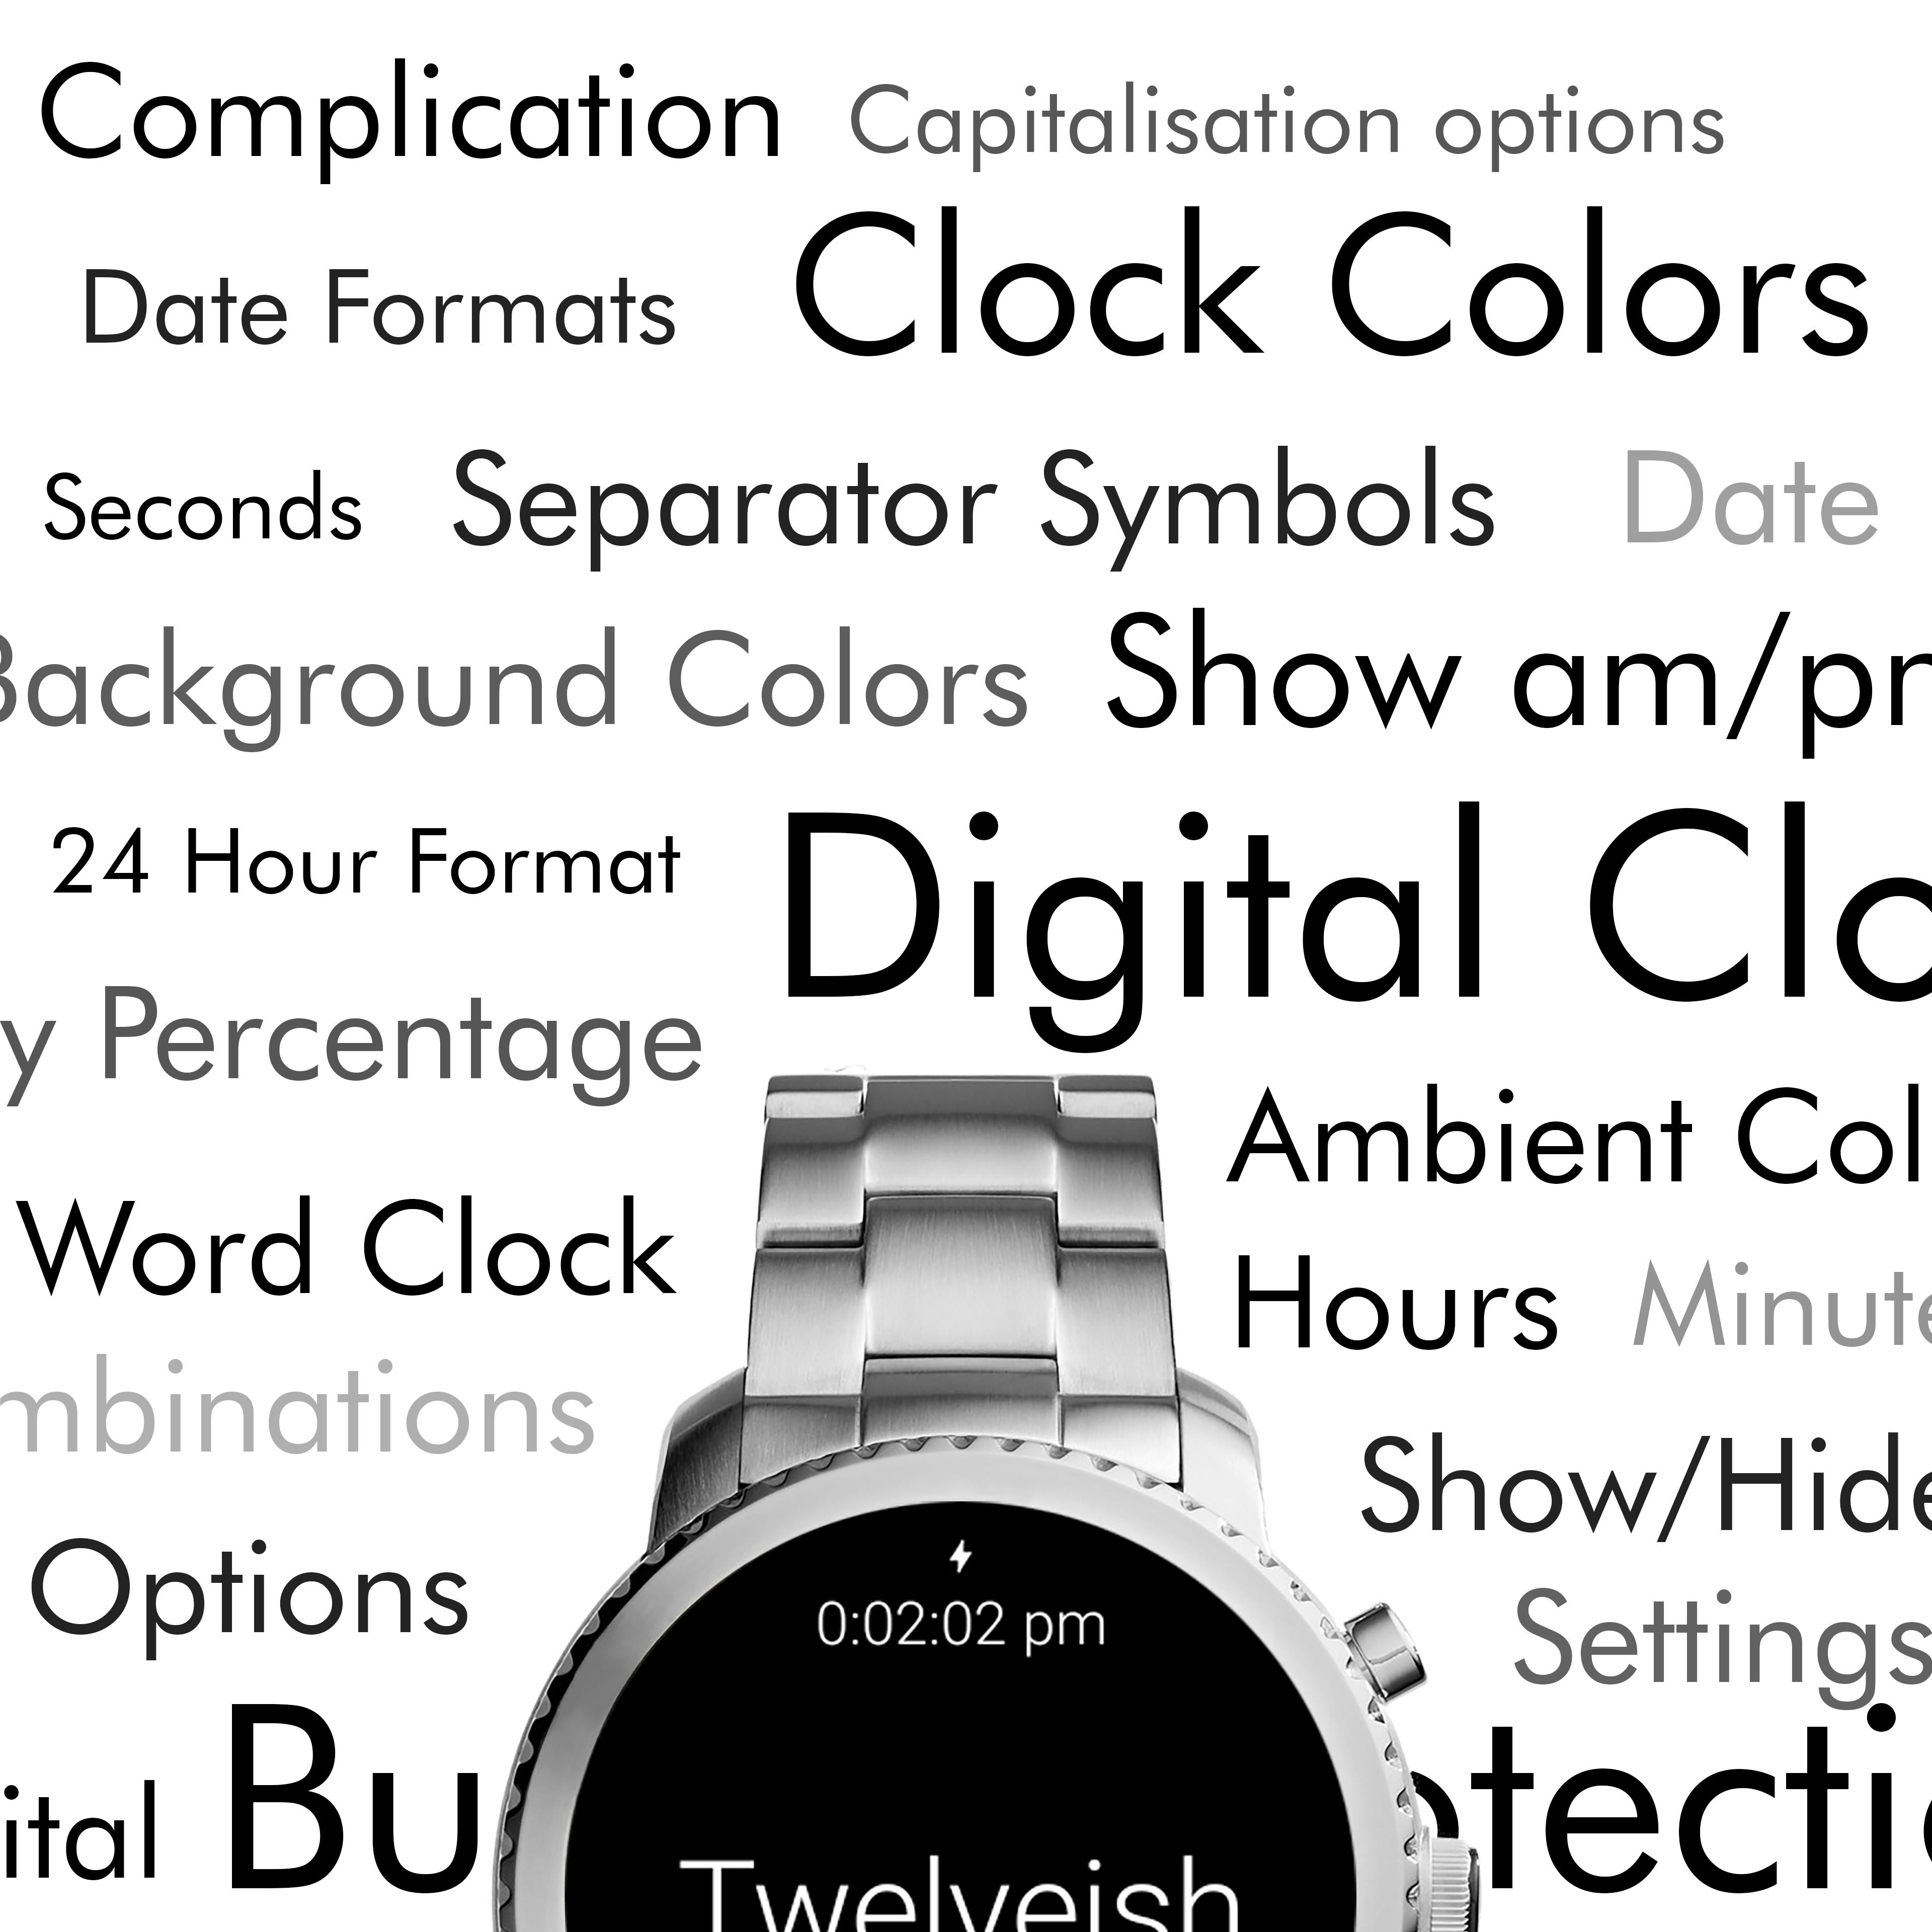 Twelveish Watch Face for Wear OS (Android Wear) - Screenshot3